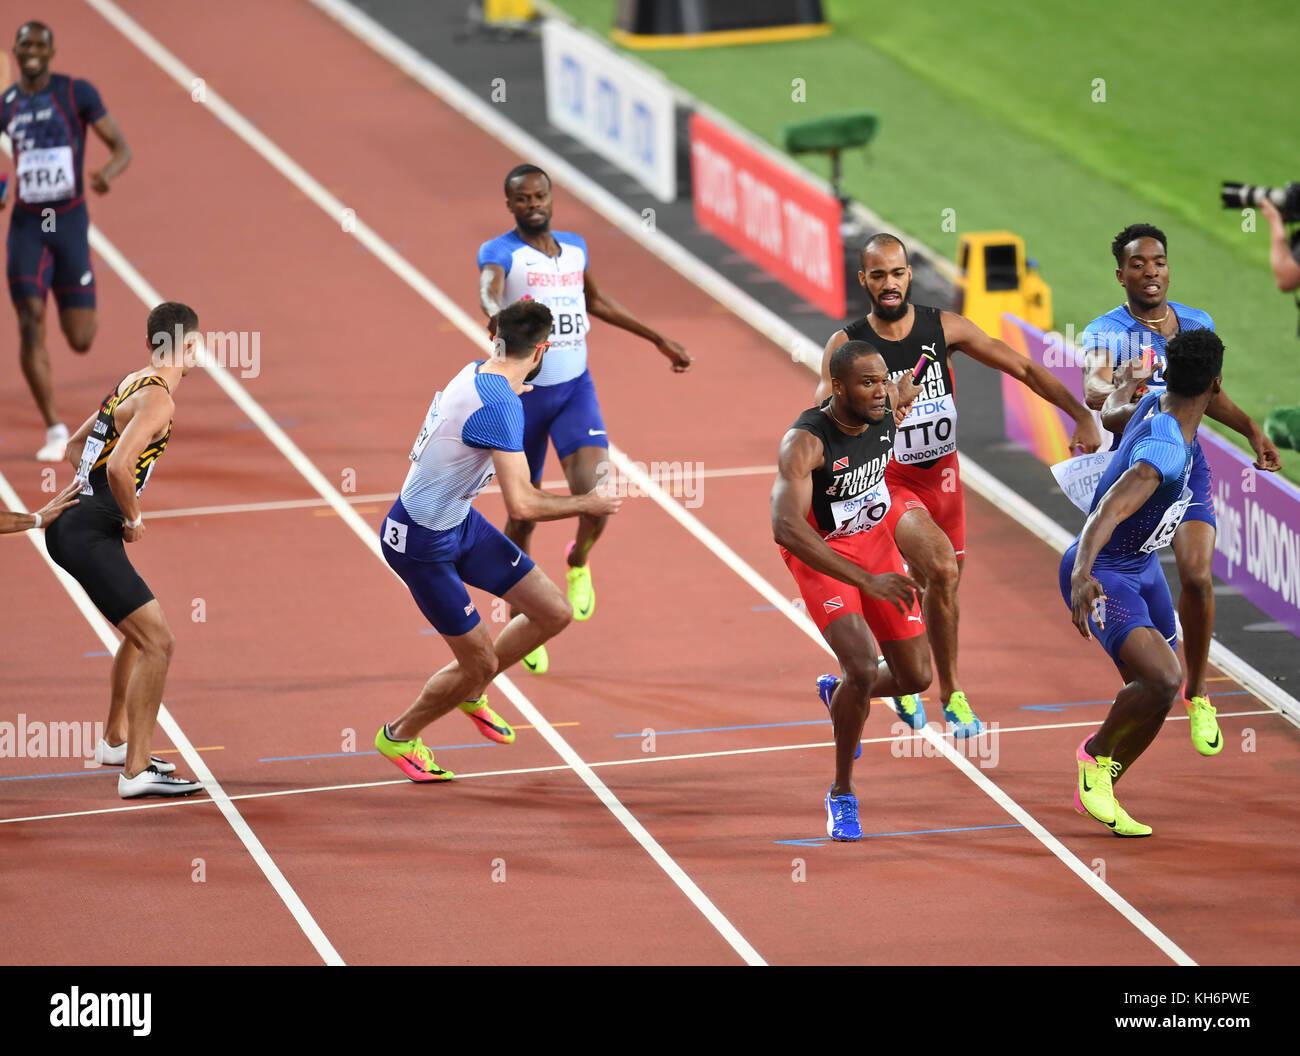 Trinidad & Tobago - 4x400 Men's relays Gold Medal - IAAF World Championships - London 2017 - Stock Image